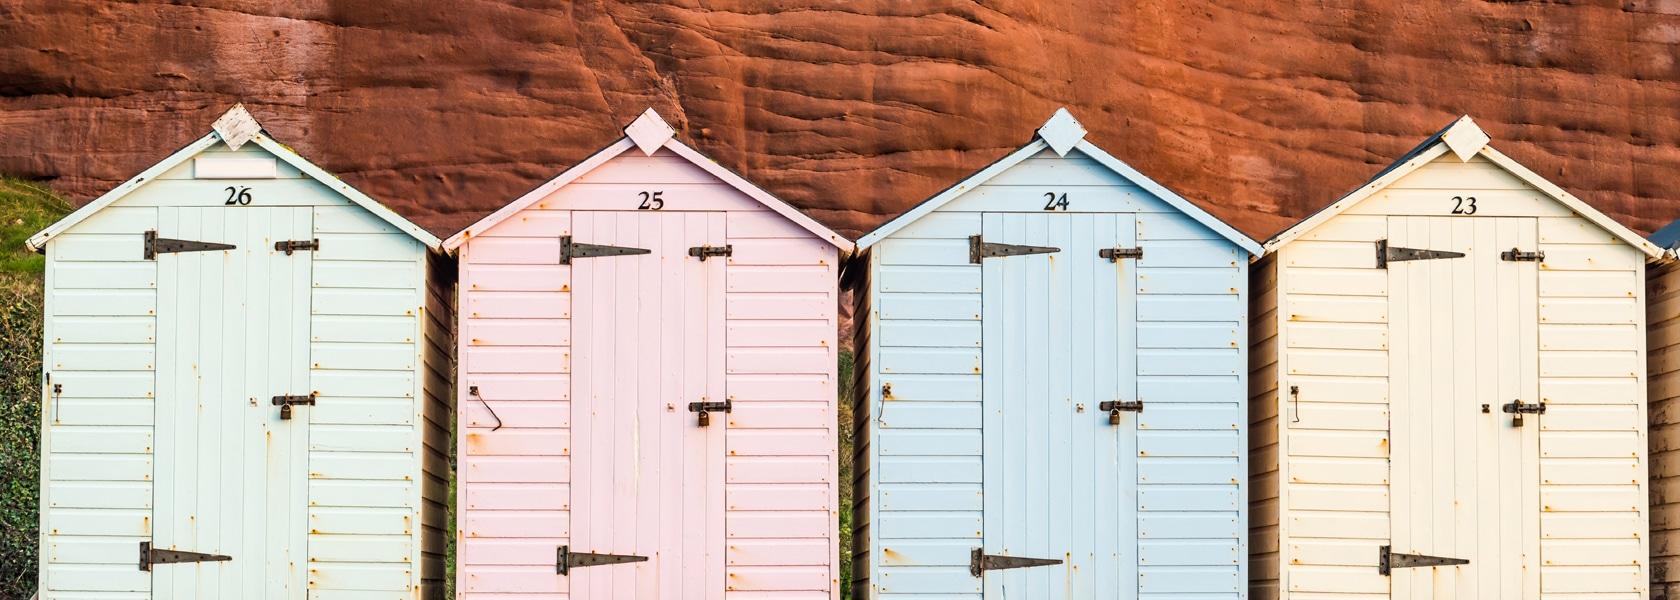 Exmouth_Beachhuts_1680px